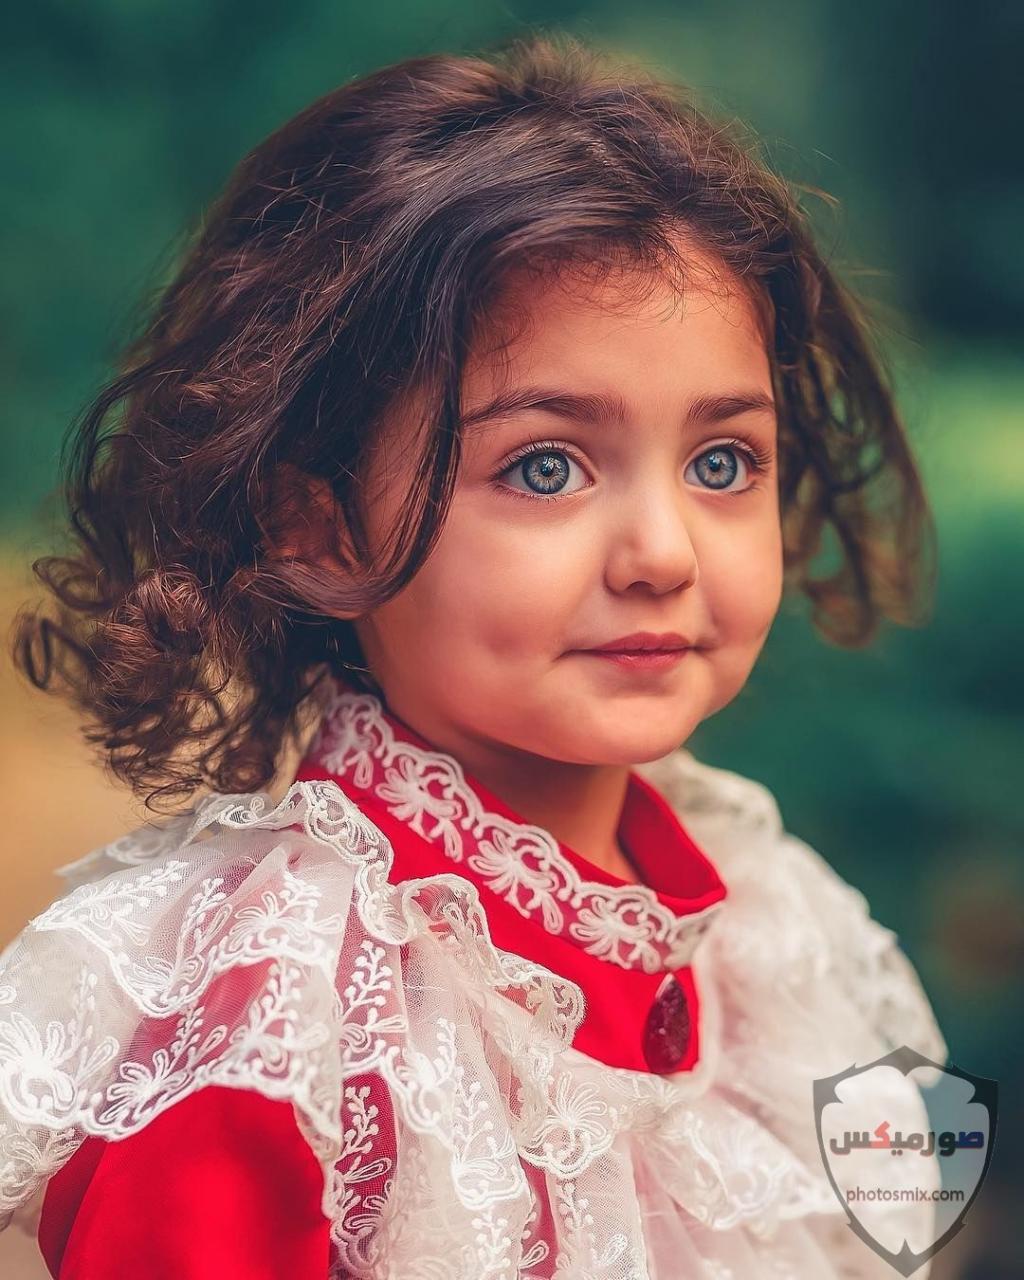 صور اطفال صور بيبي صور اولاد صور حلوين اطفال حلوينصور اطفال صغار2020 62